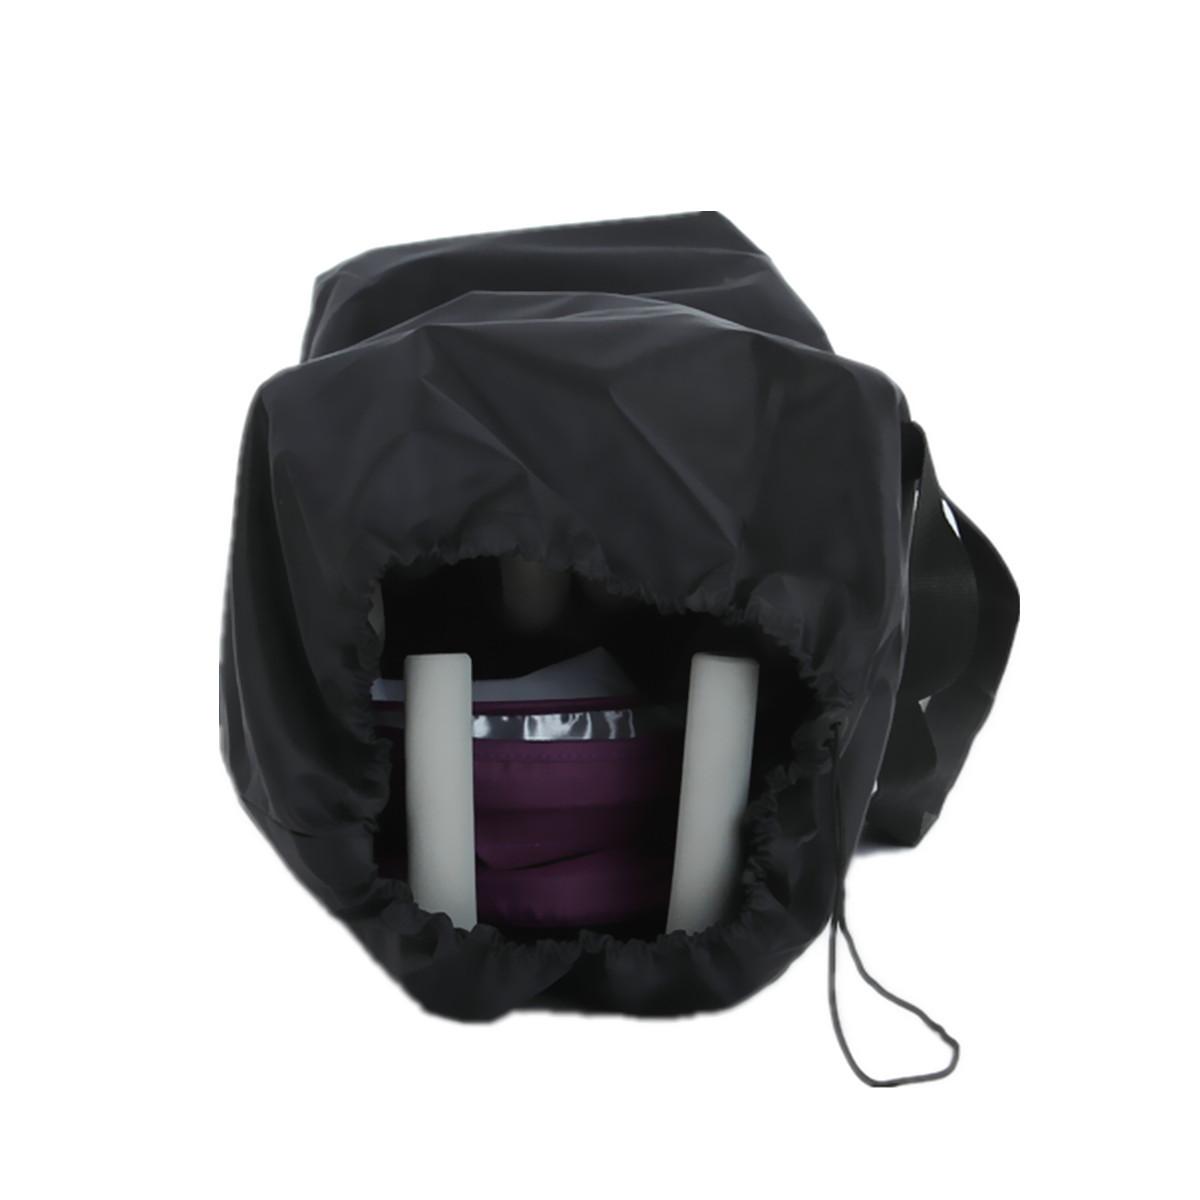 Gate Check Umbrella Stroller Pram Travel Bag Portable Air